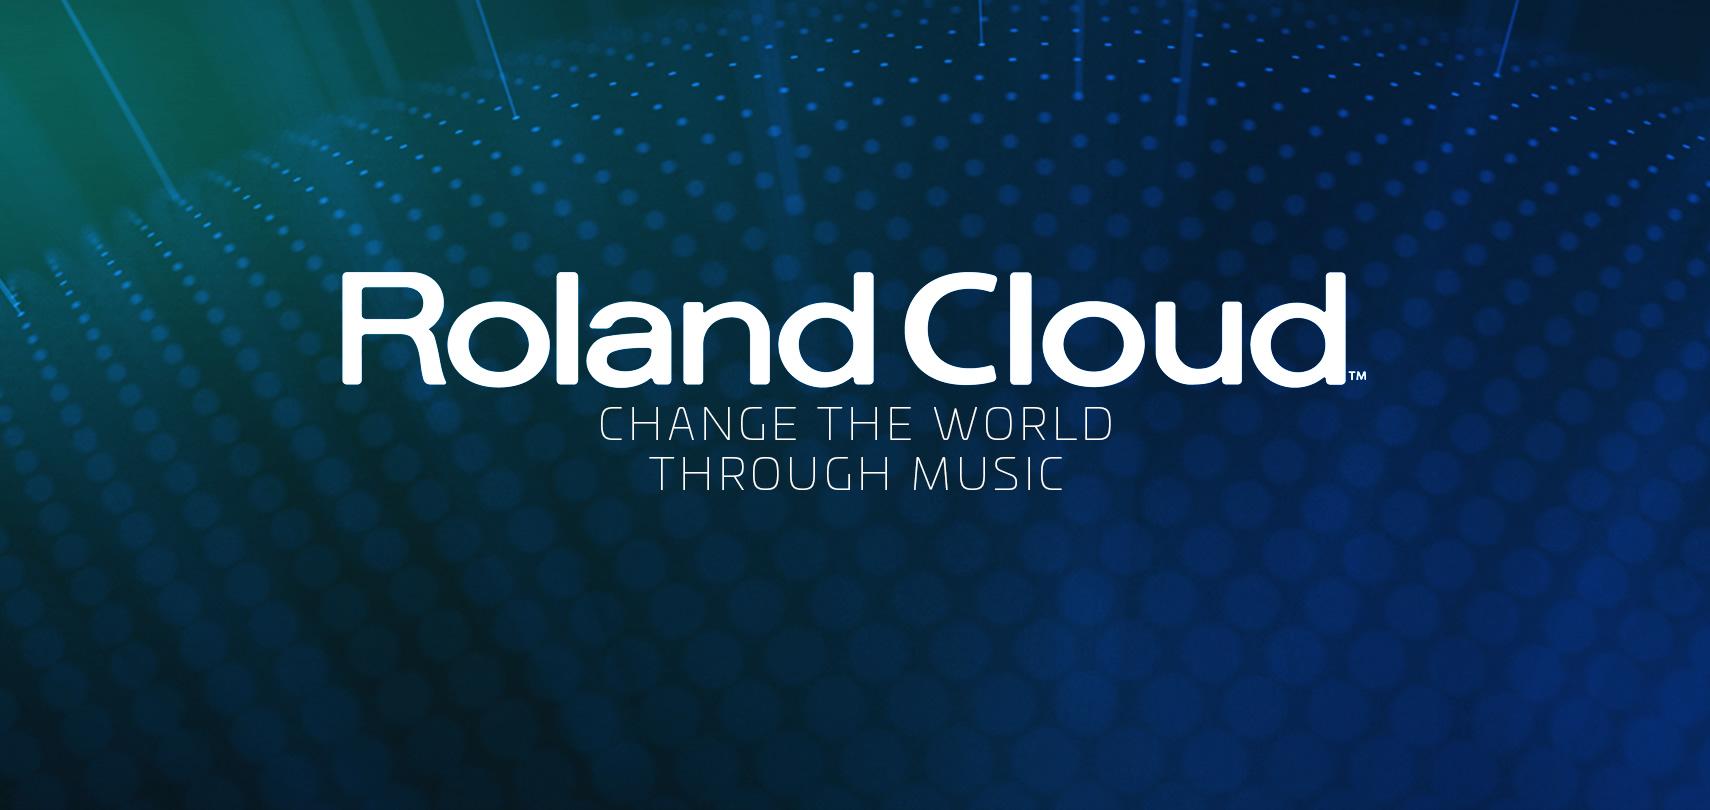 Roland Cloud Change The World Through Music!